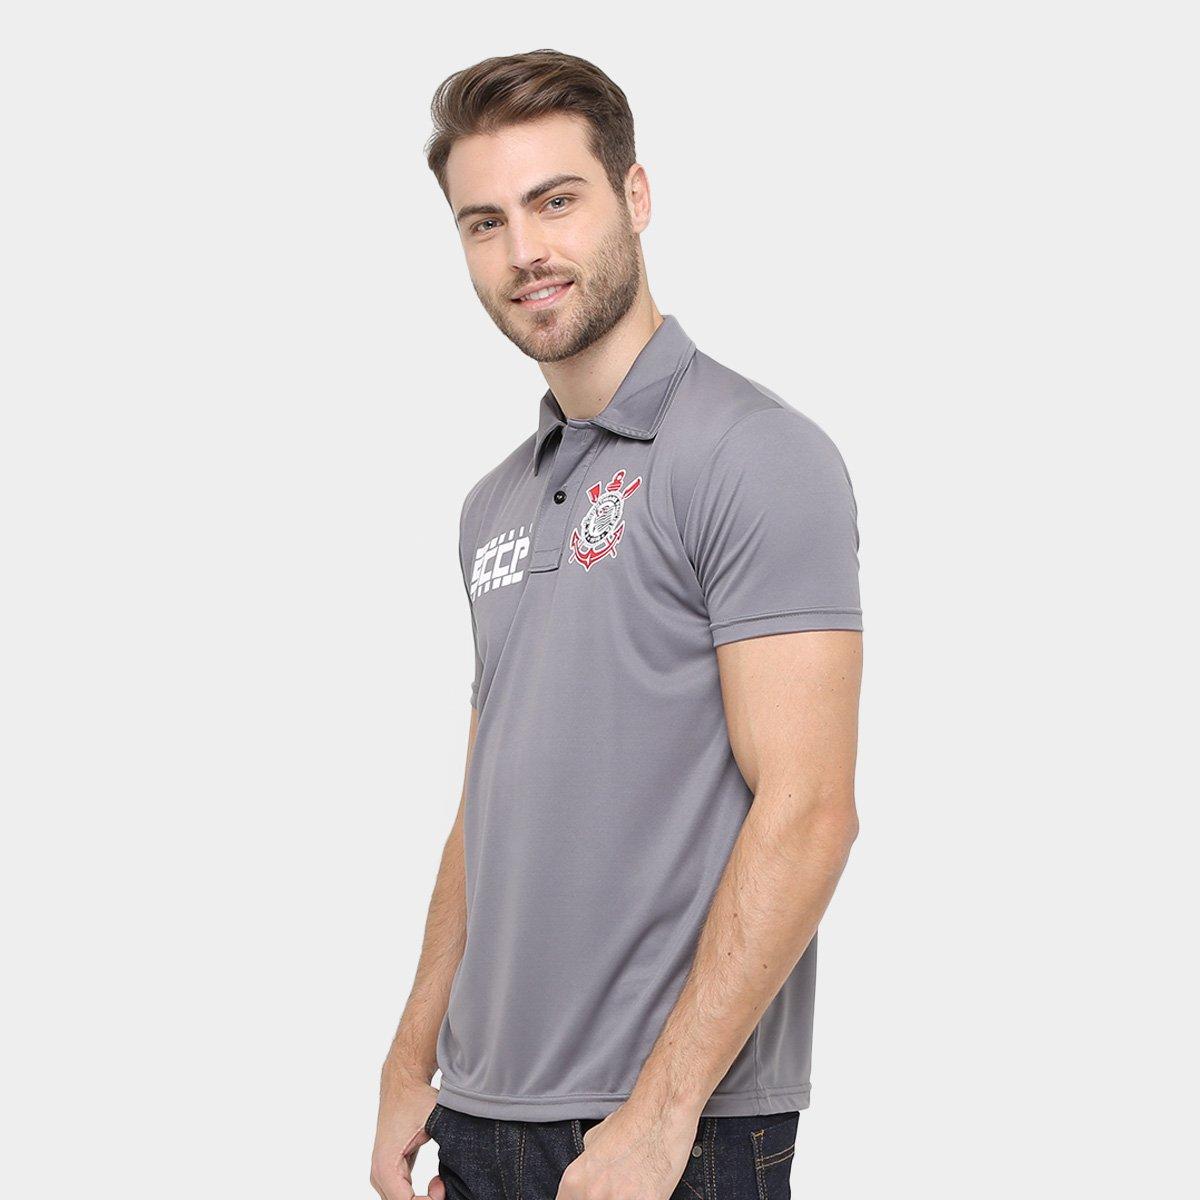 6627528afe777 Camisa Polo Corinthians Future Masculina - Compre Agora